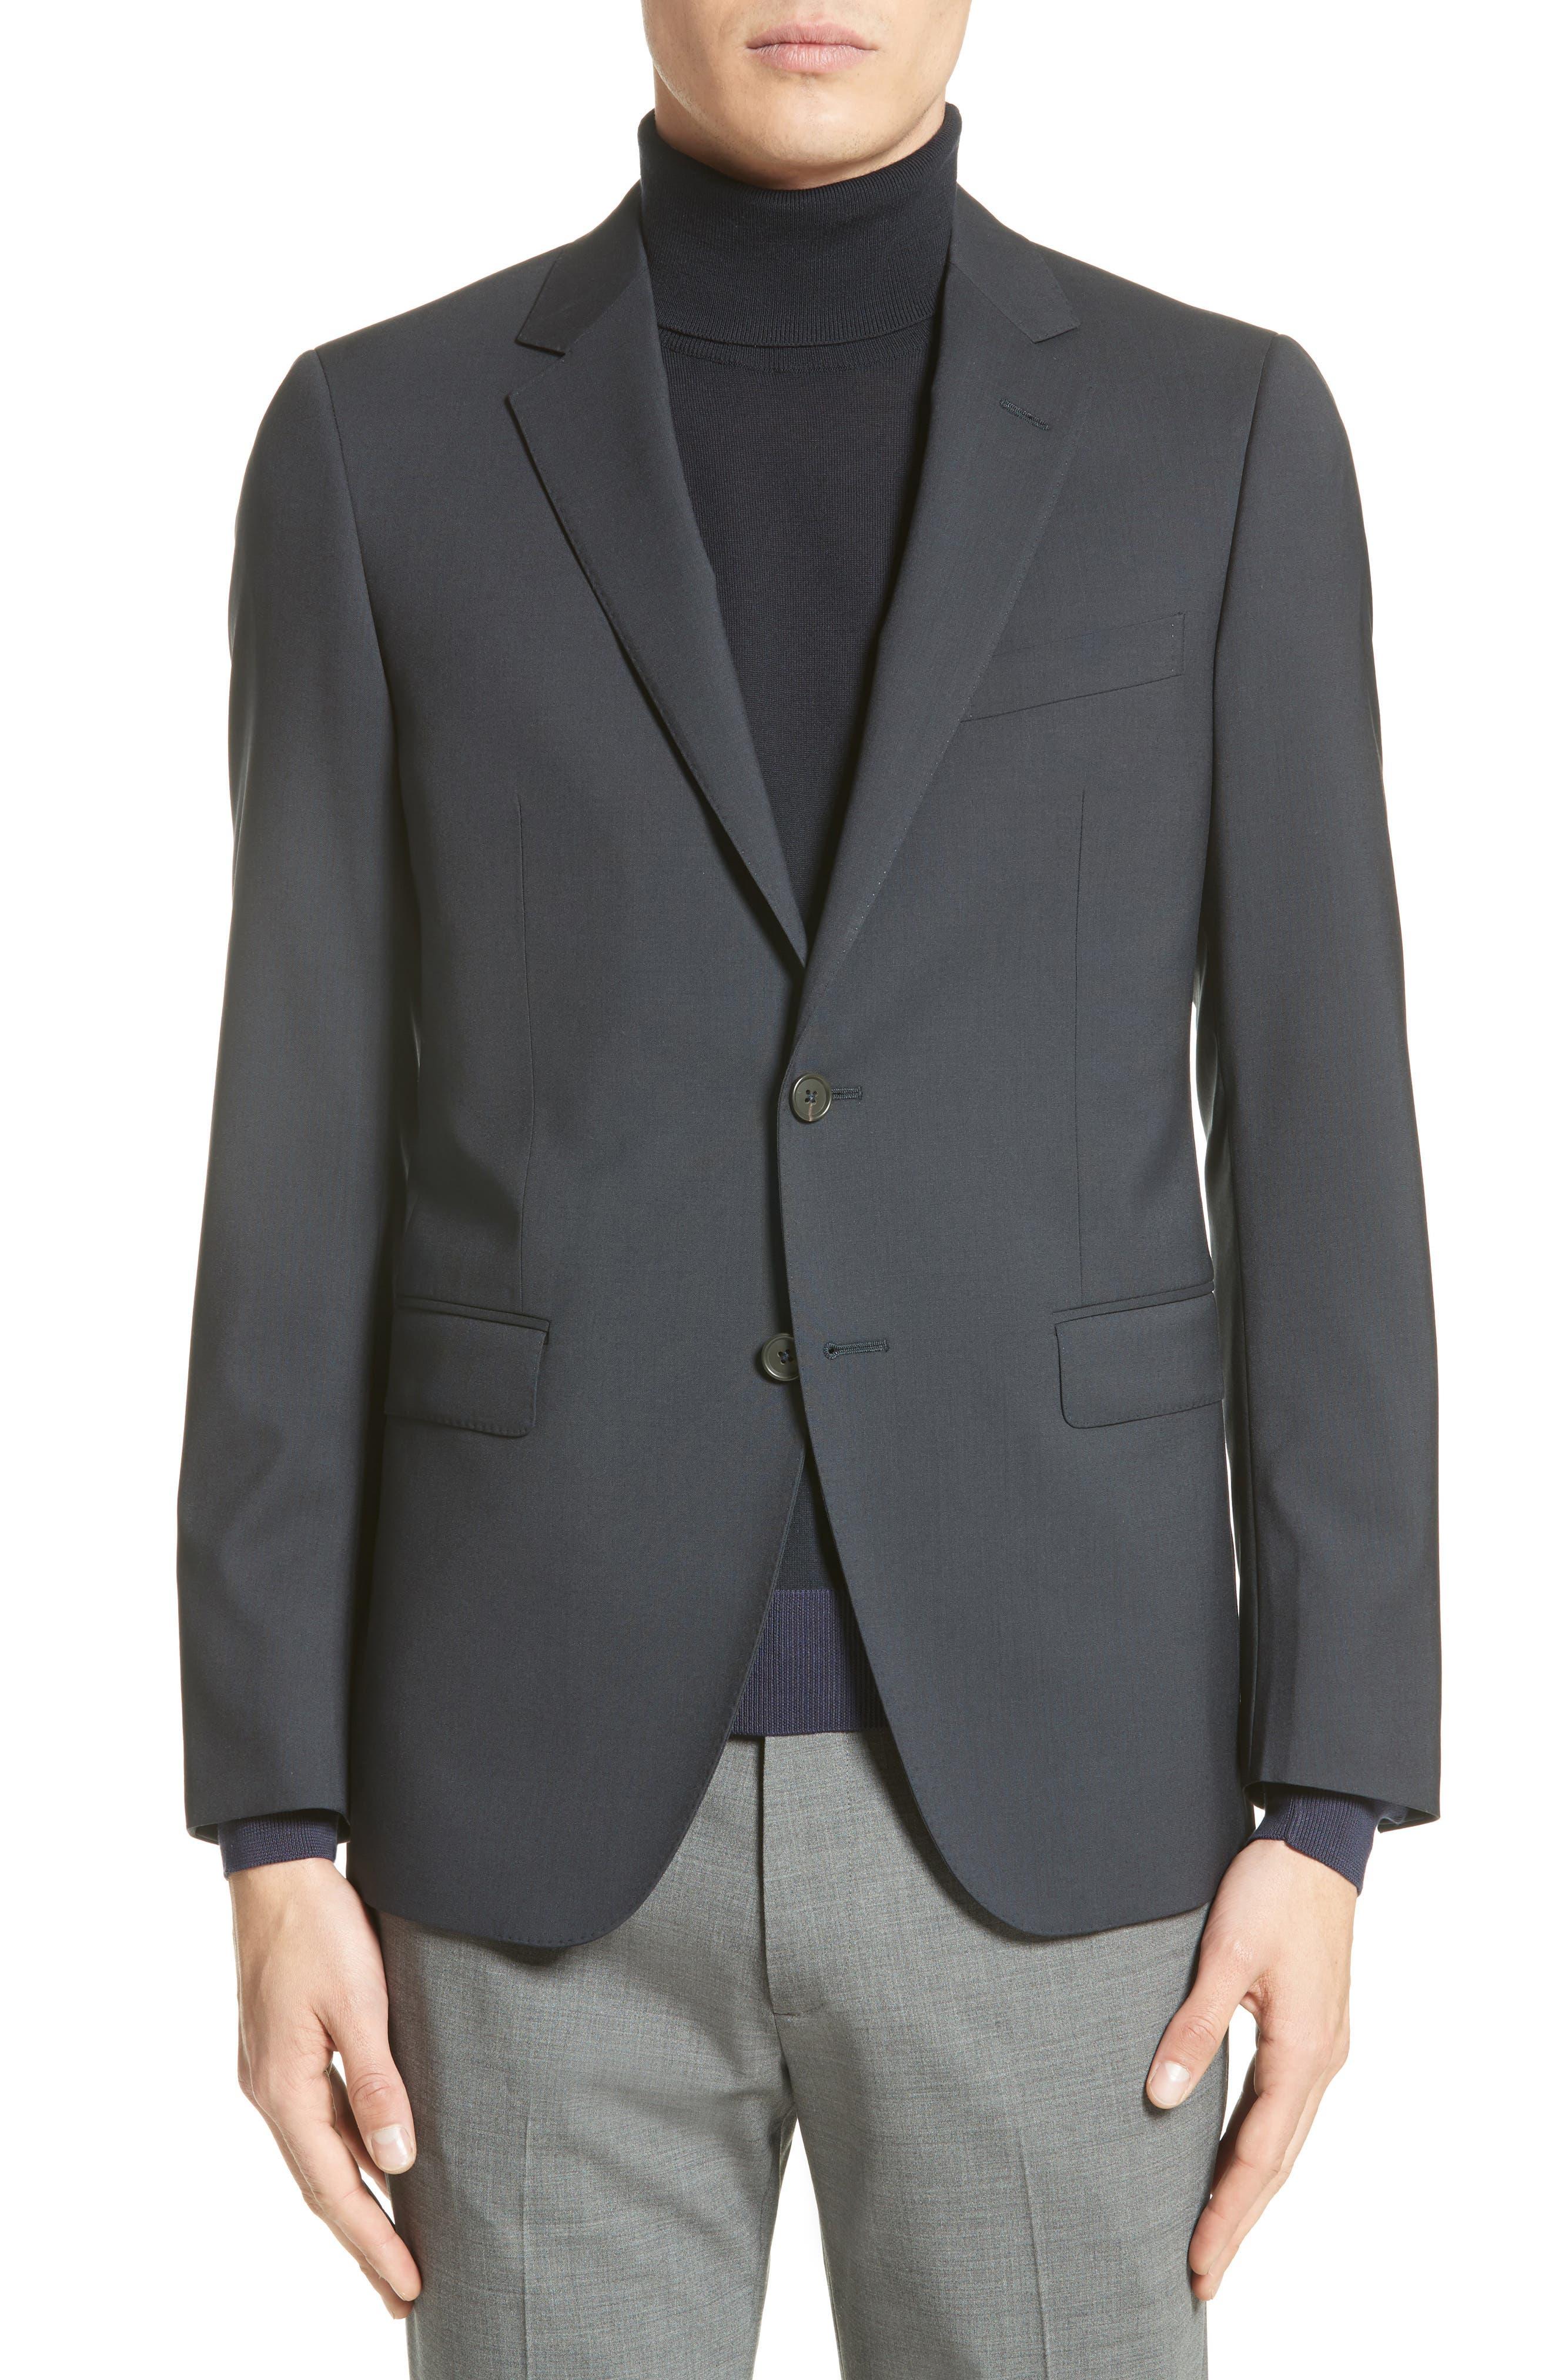 Tropical Wool Suit Jacket,                             Alternate thumbnail 2, color,                             NAVY